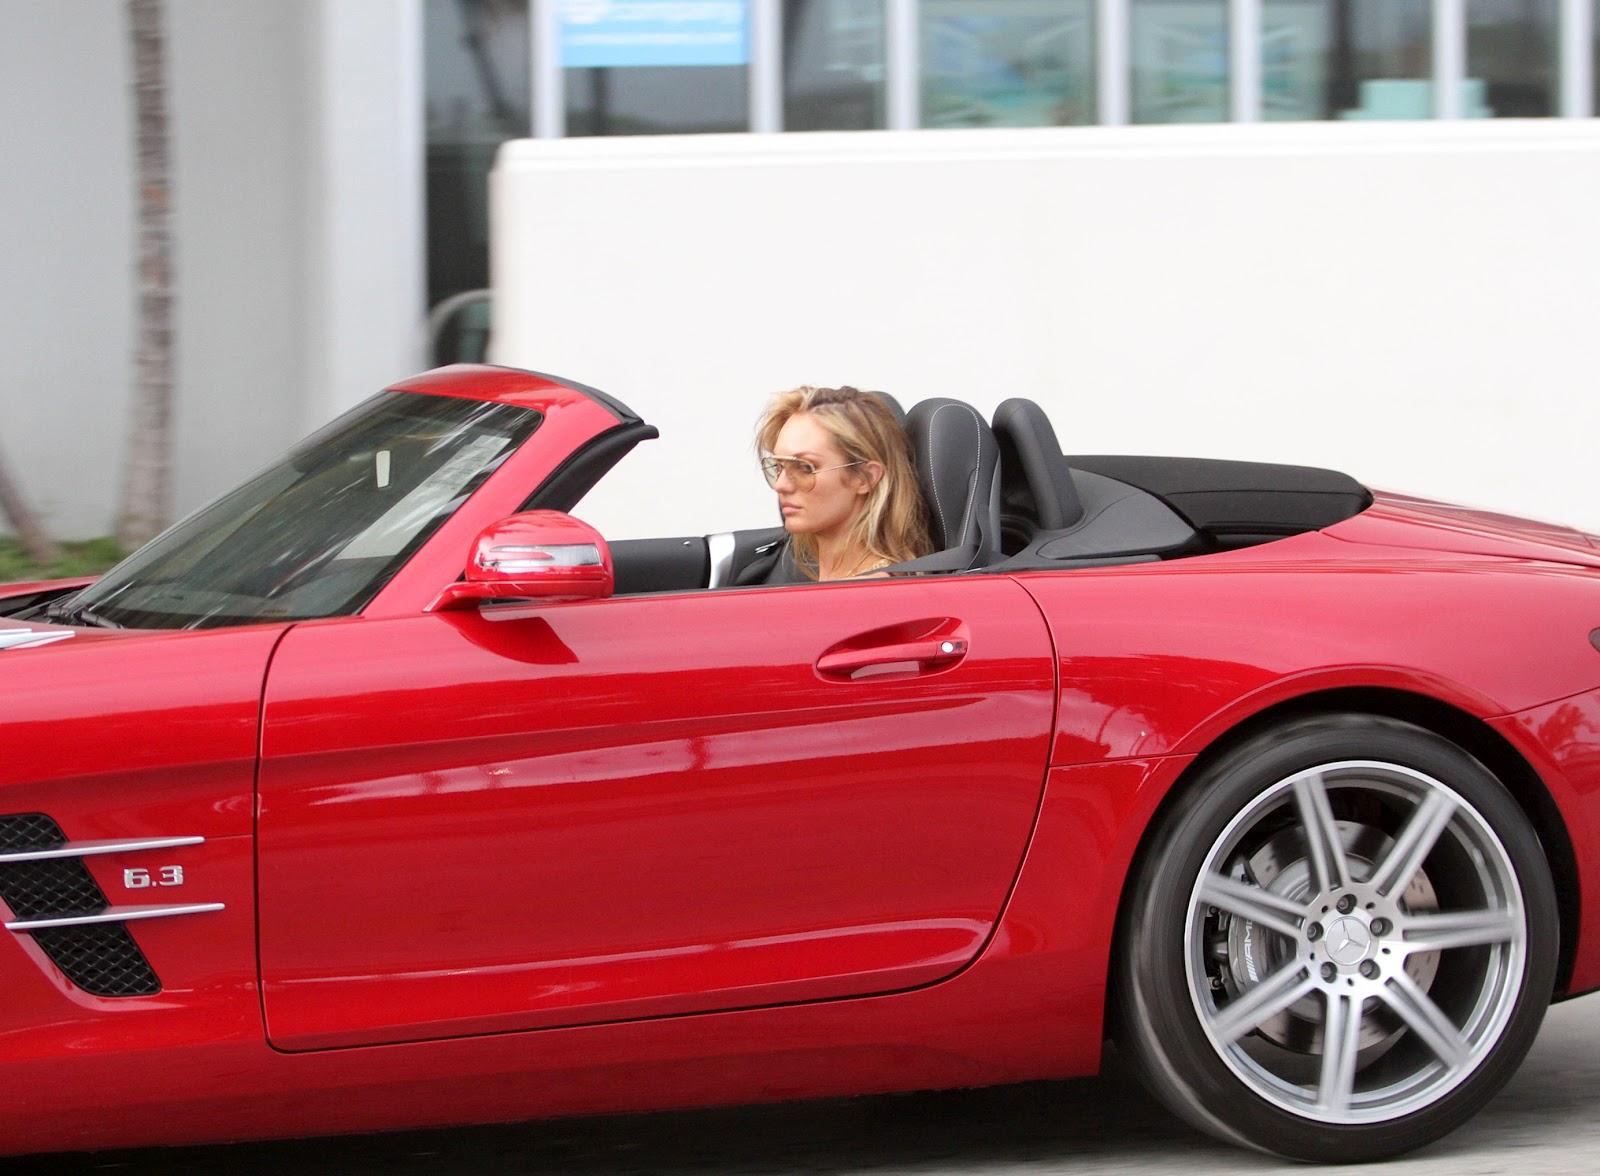 SLS car - Color: Red  // Description: sporty